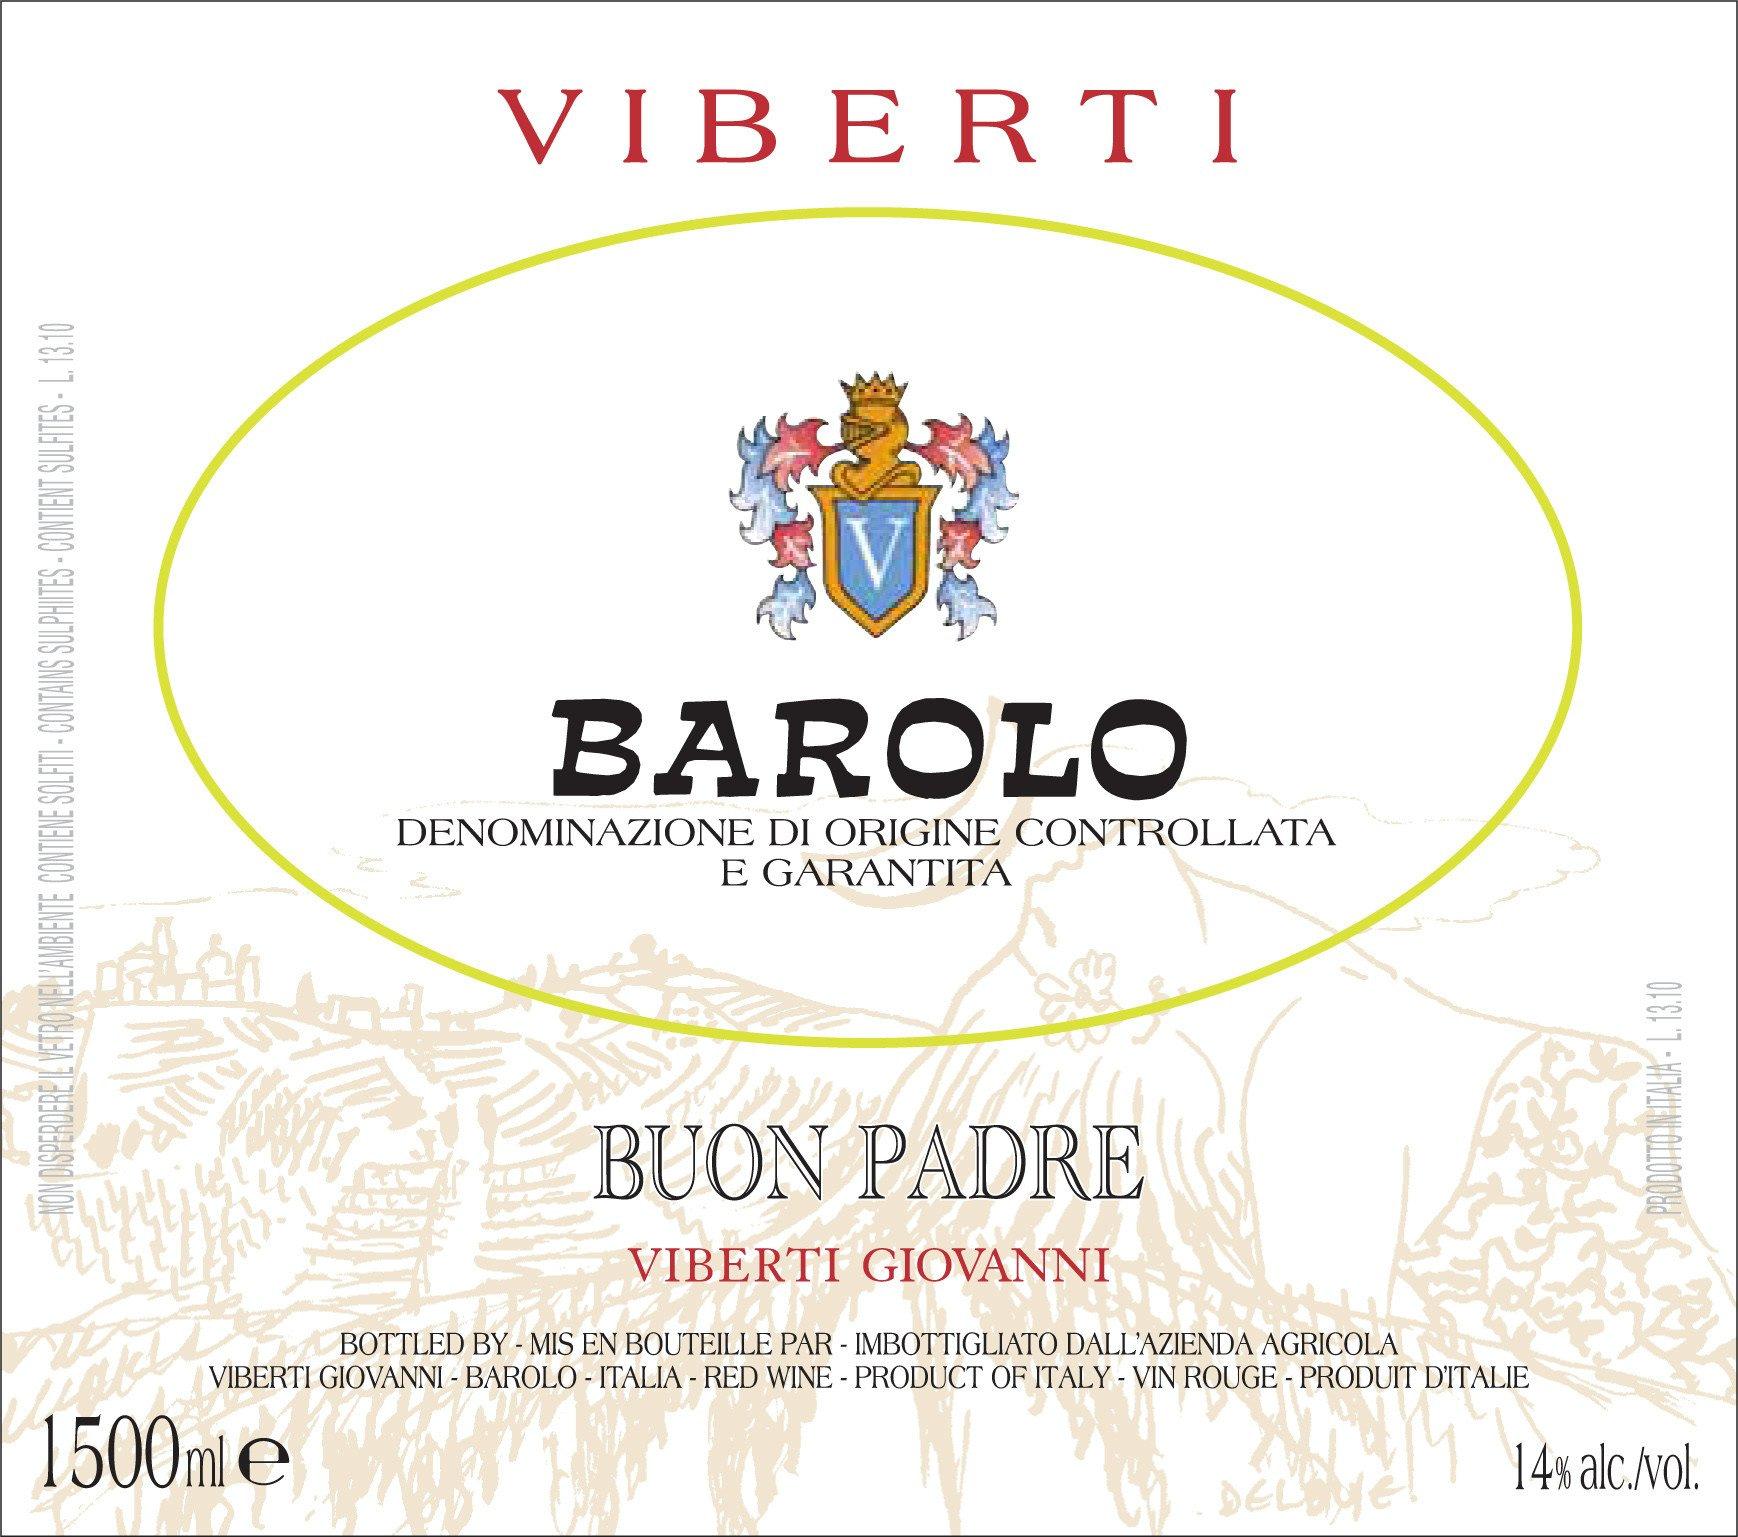 Viberti Barolo Buon Padre Jeroboam 2010